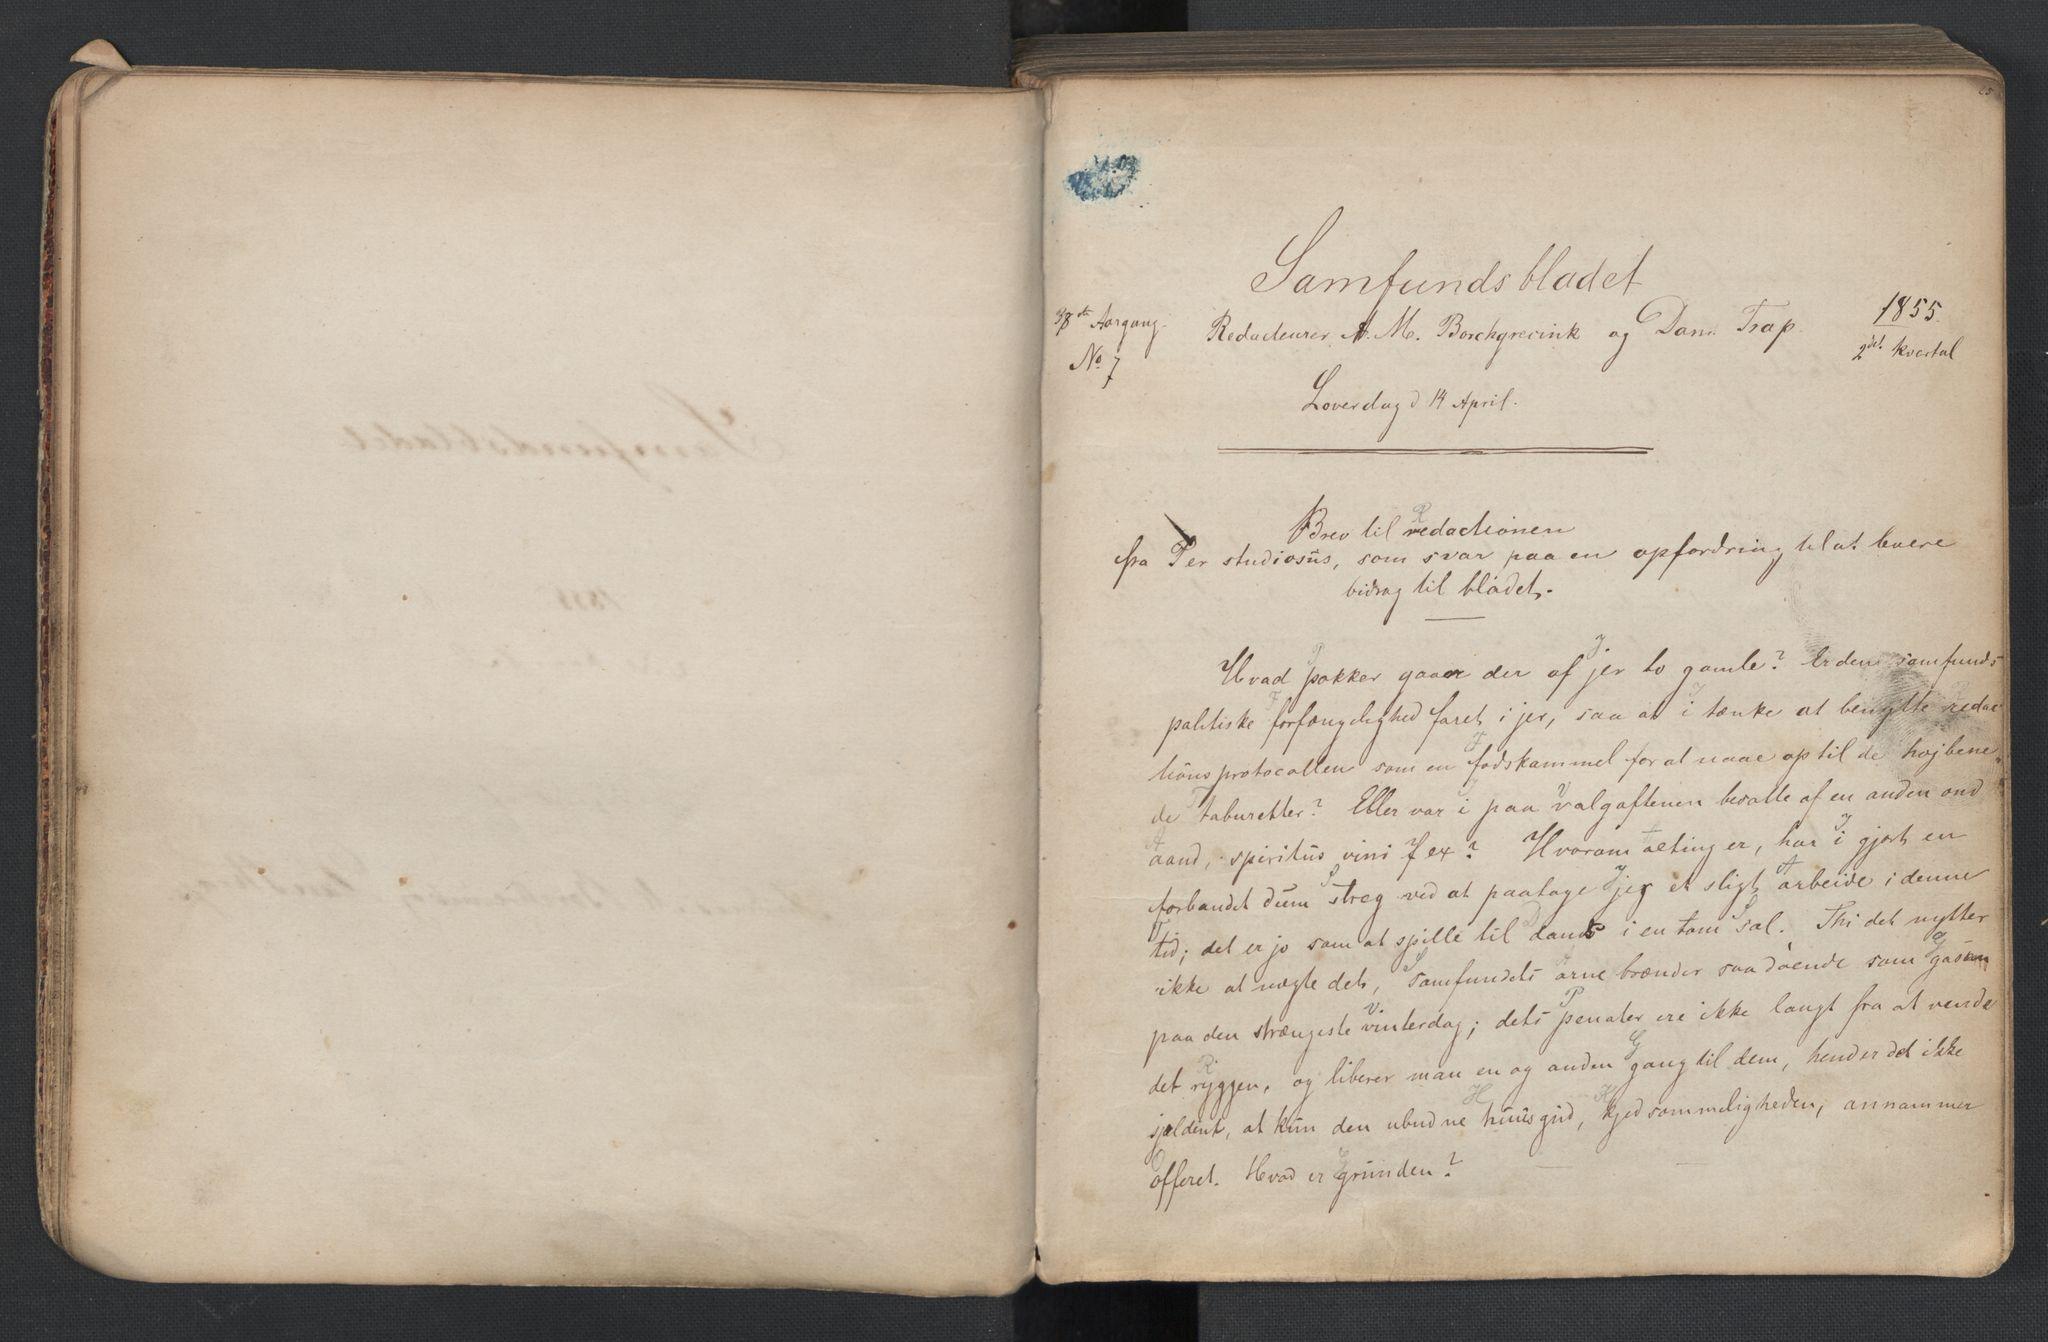 RA, Det Norske Studentersamfund, X/Xa/L0005, 1855-1856, s. 14